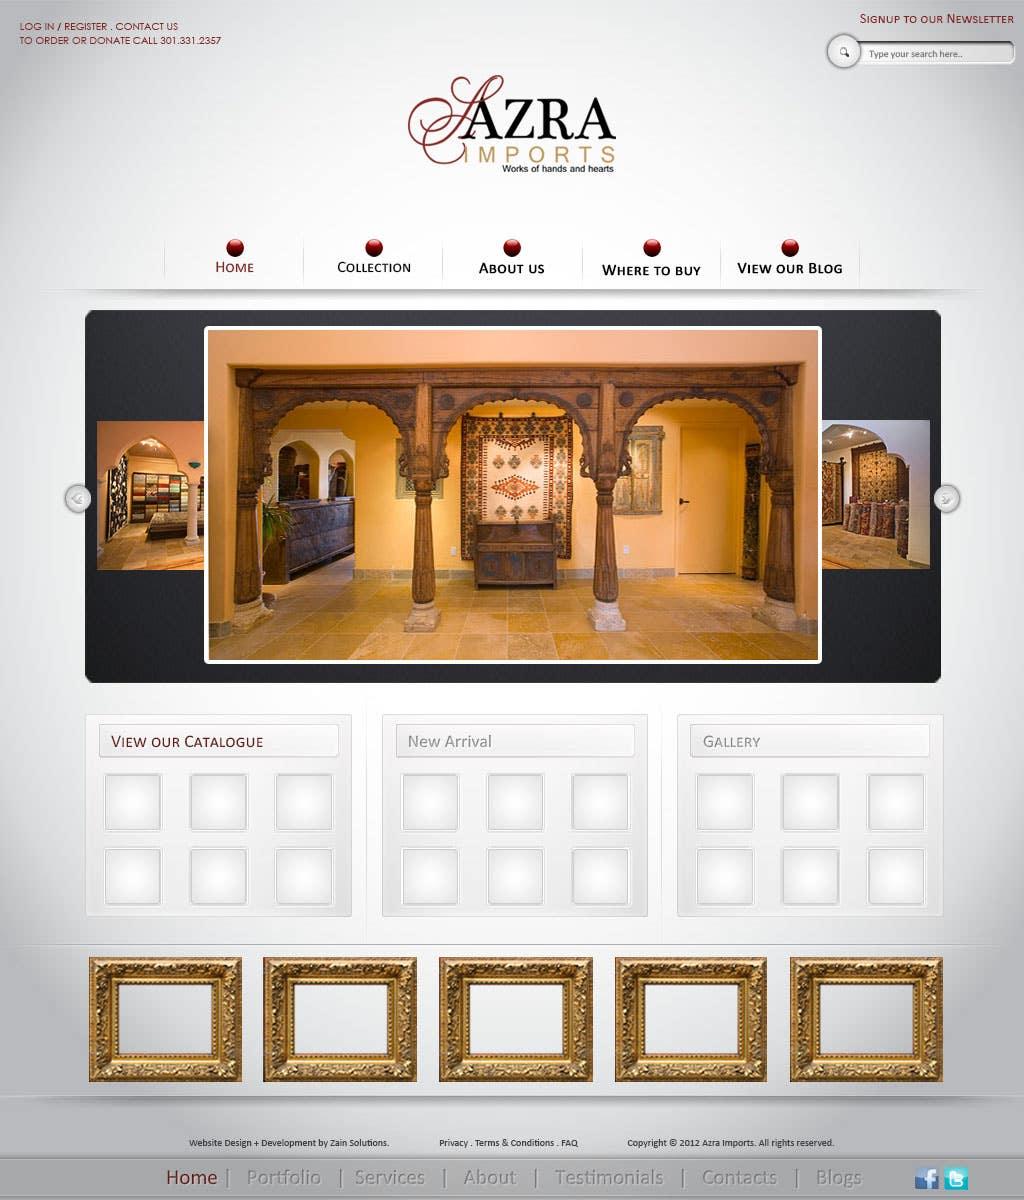 In-house designing of website